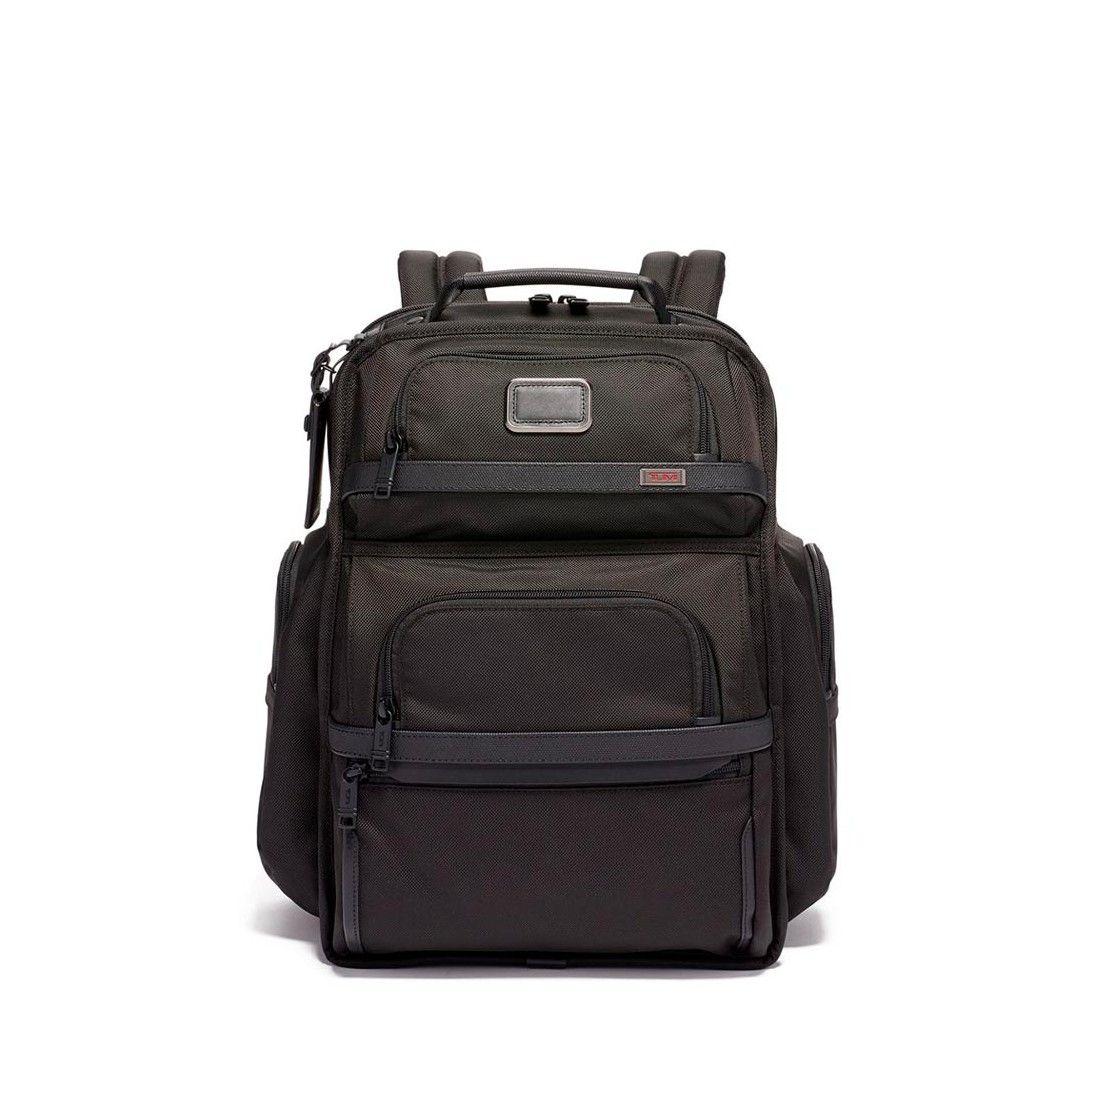 Mochila Business Class Briefpack Tumi T-Pass - Tumi - 1